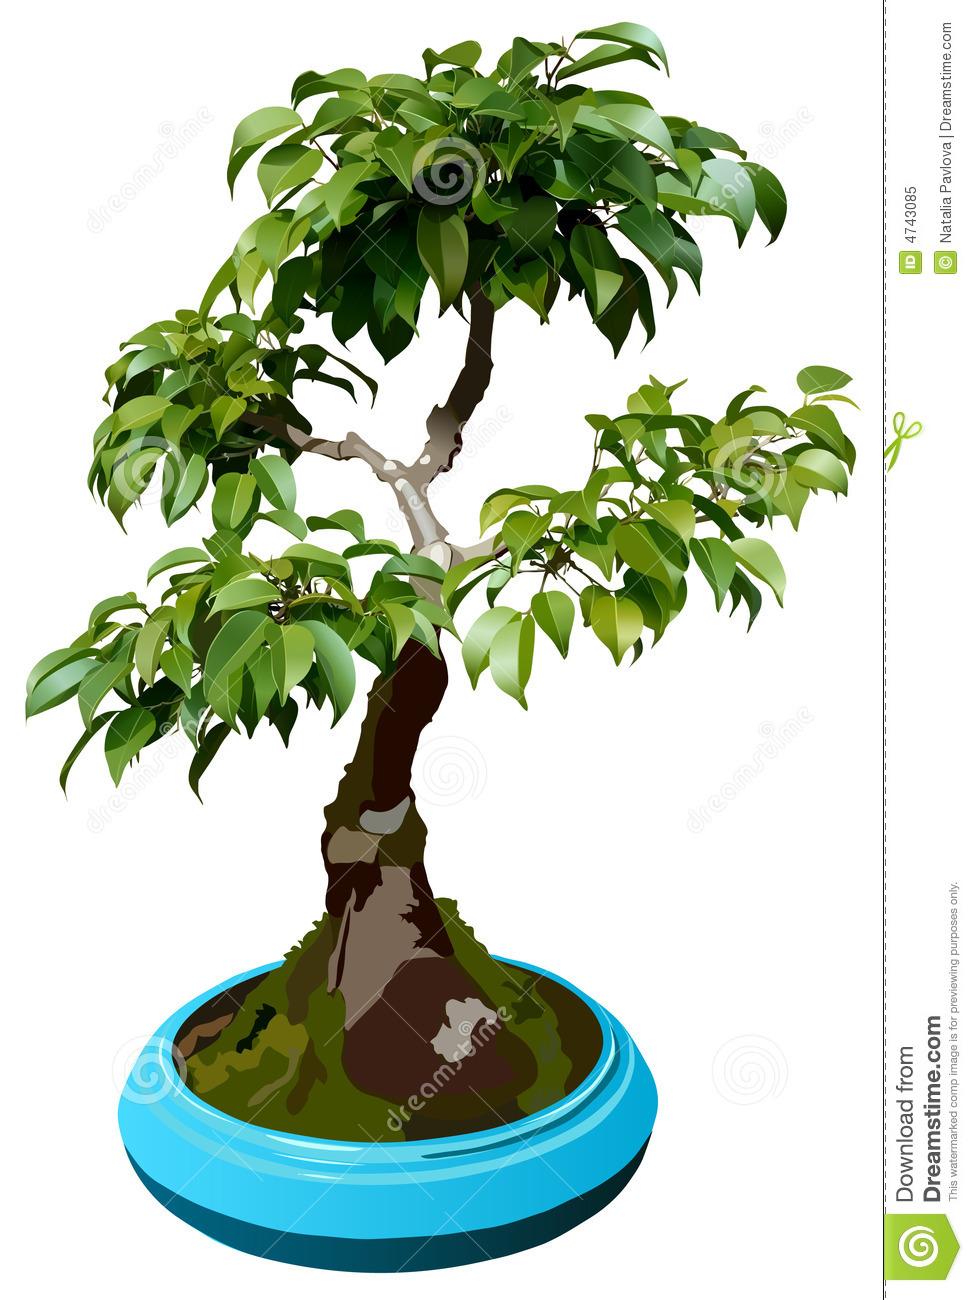 Illustration Of Dwarf Tree Royalty Free Stock Photo.